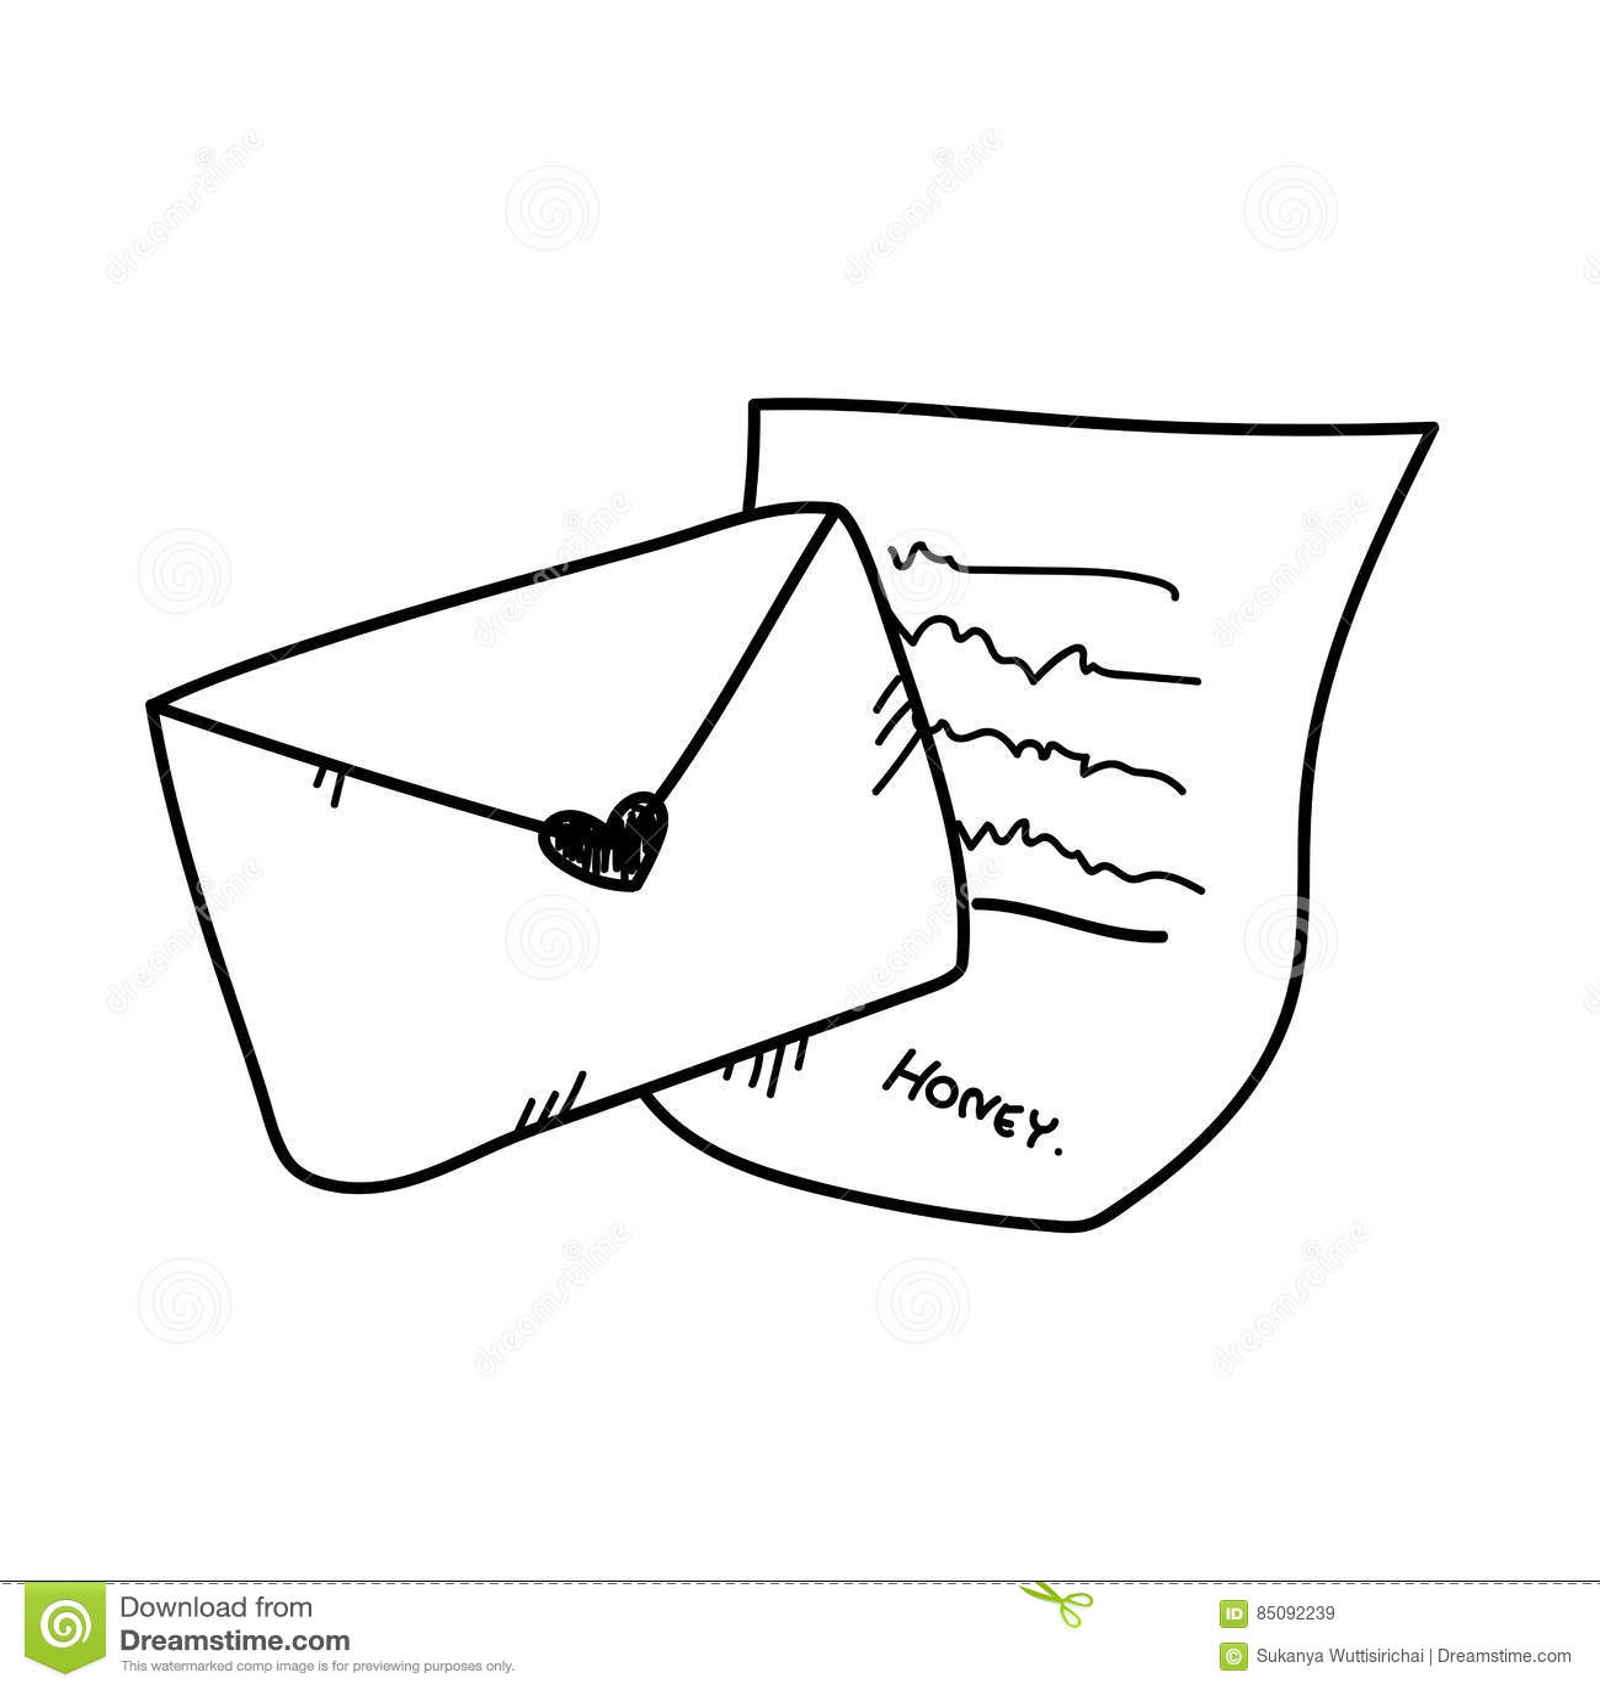 freehand drawing love letter illustration. stock illustration